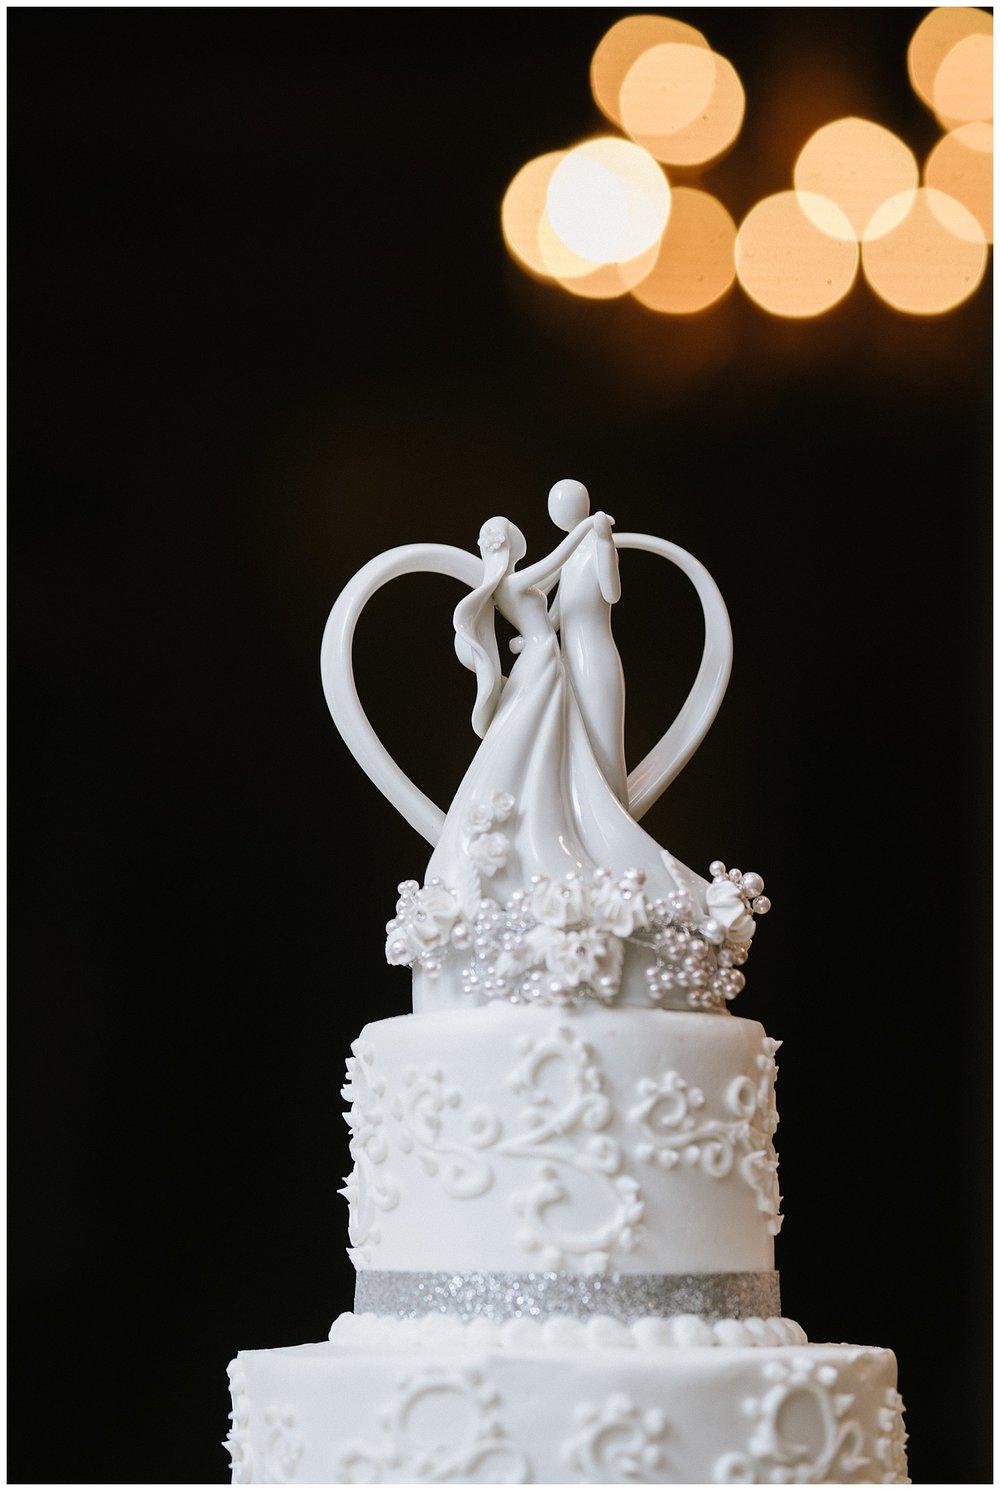 Long Island Weddings | The Mansion at Oyster Bay Wedding | Woodbury, NY | www.redoakweddings.com